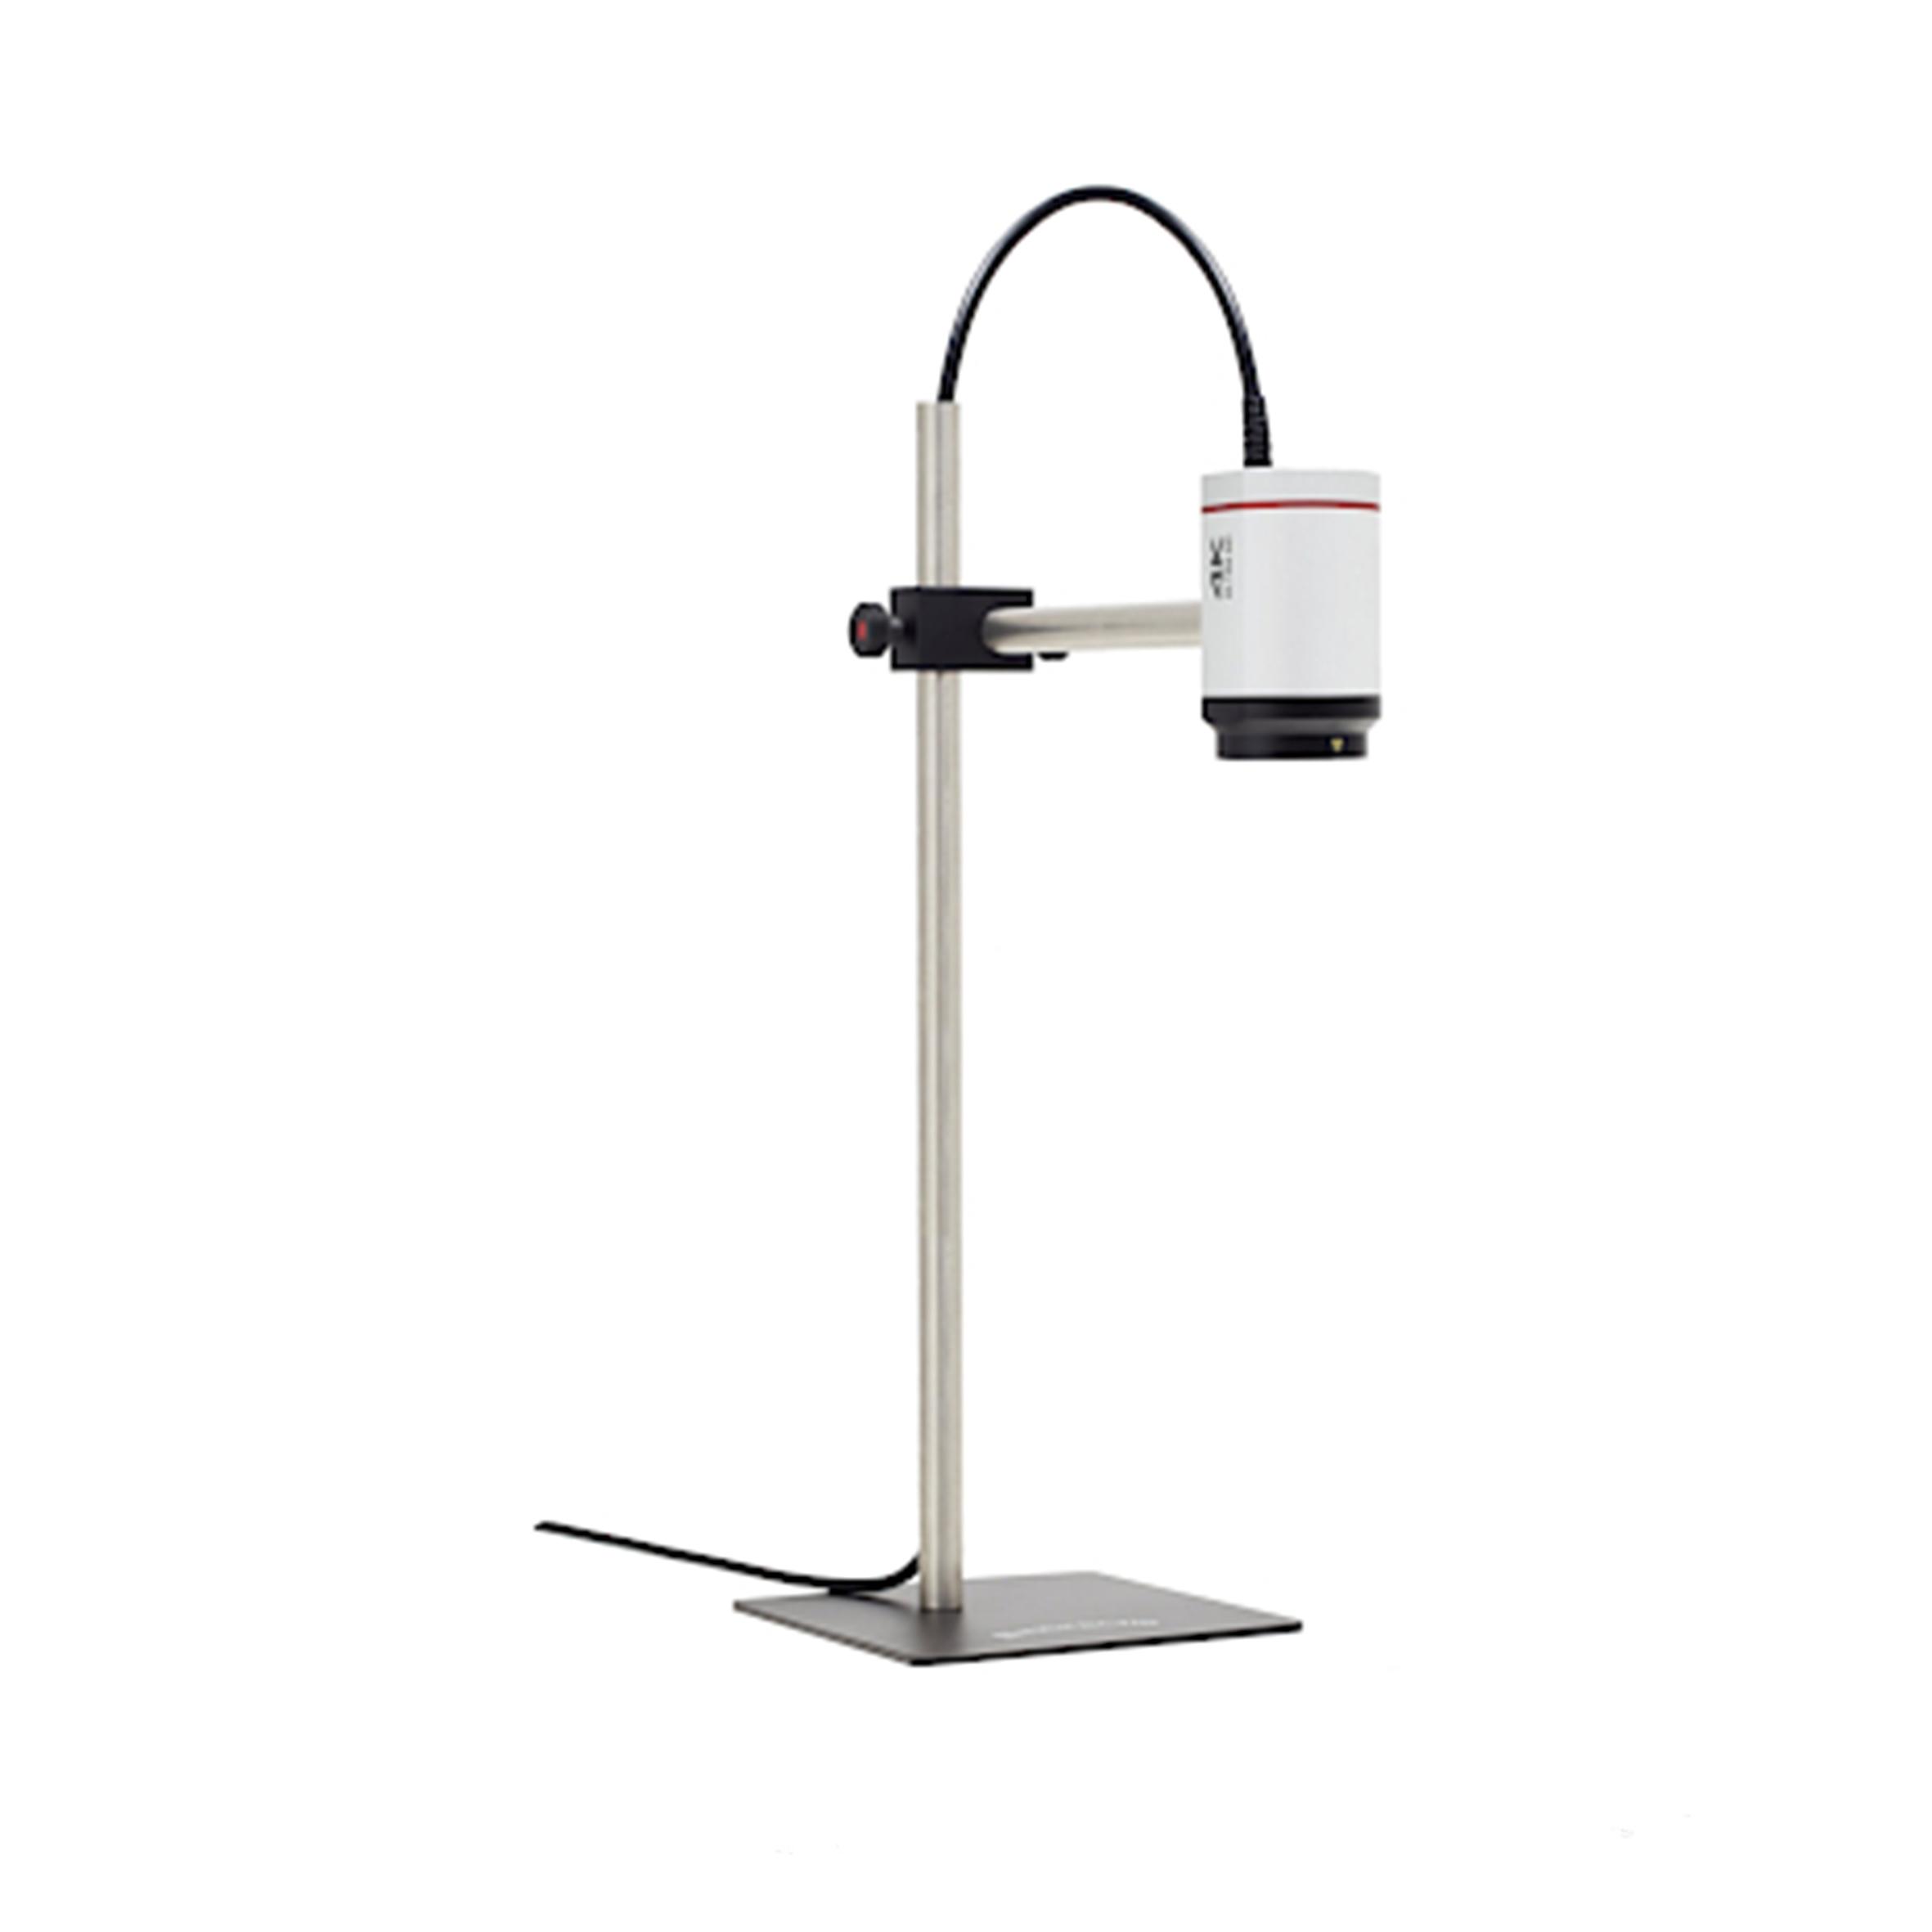 Microscopio modular U30s Ultra HD (4K)